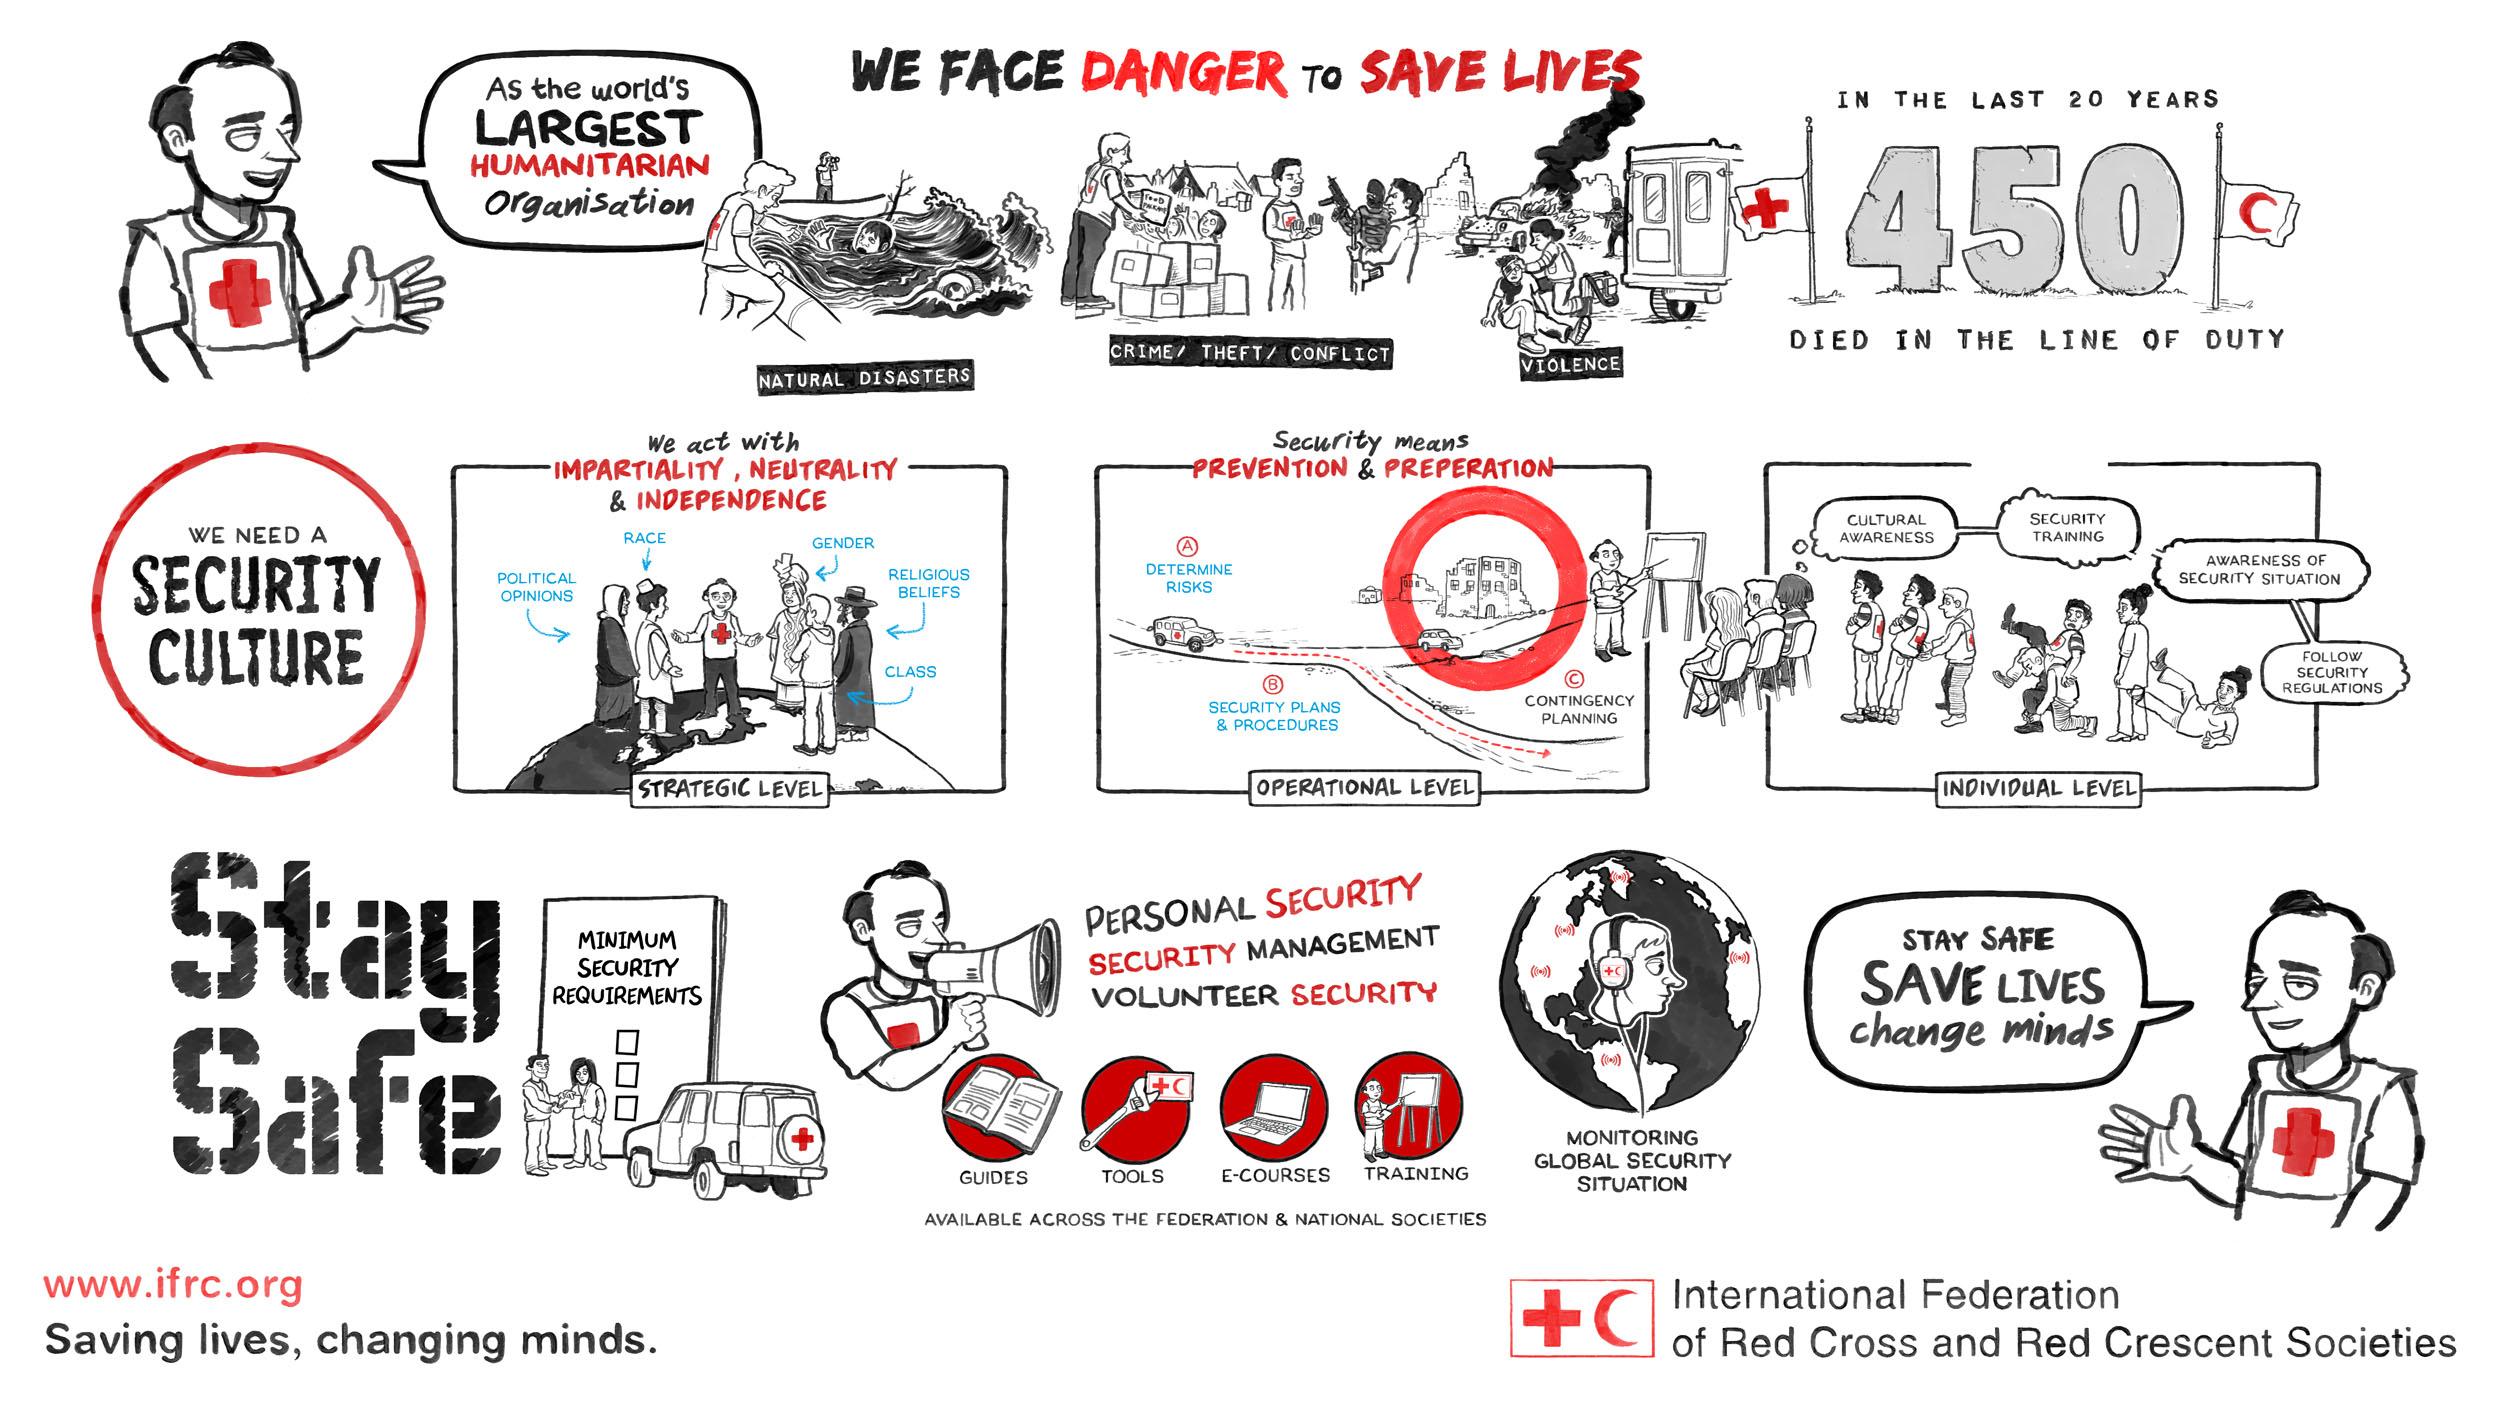 red-cross-saving-lives-changing-minds-cognitive-08.jpg